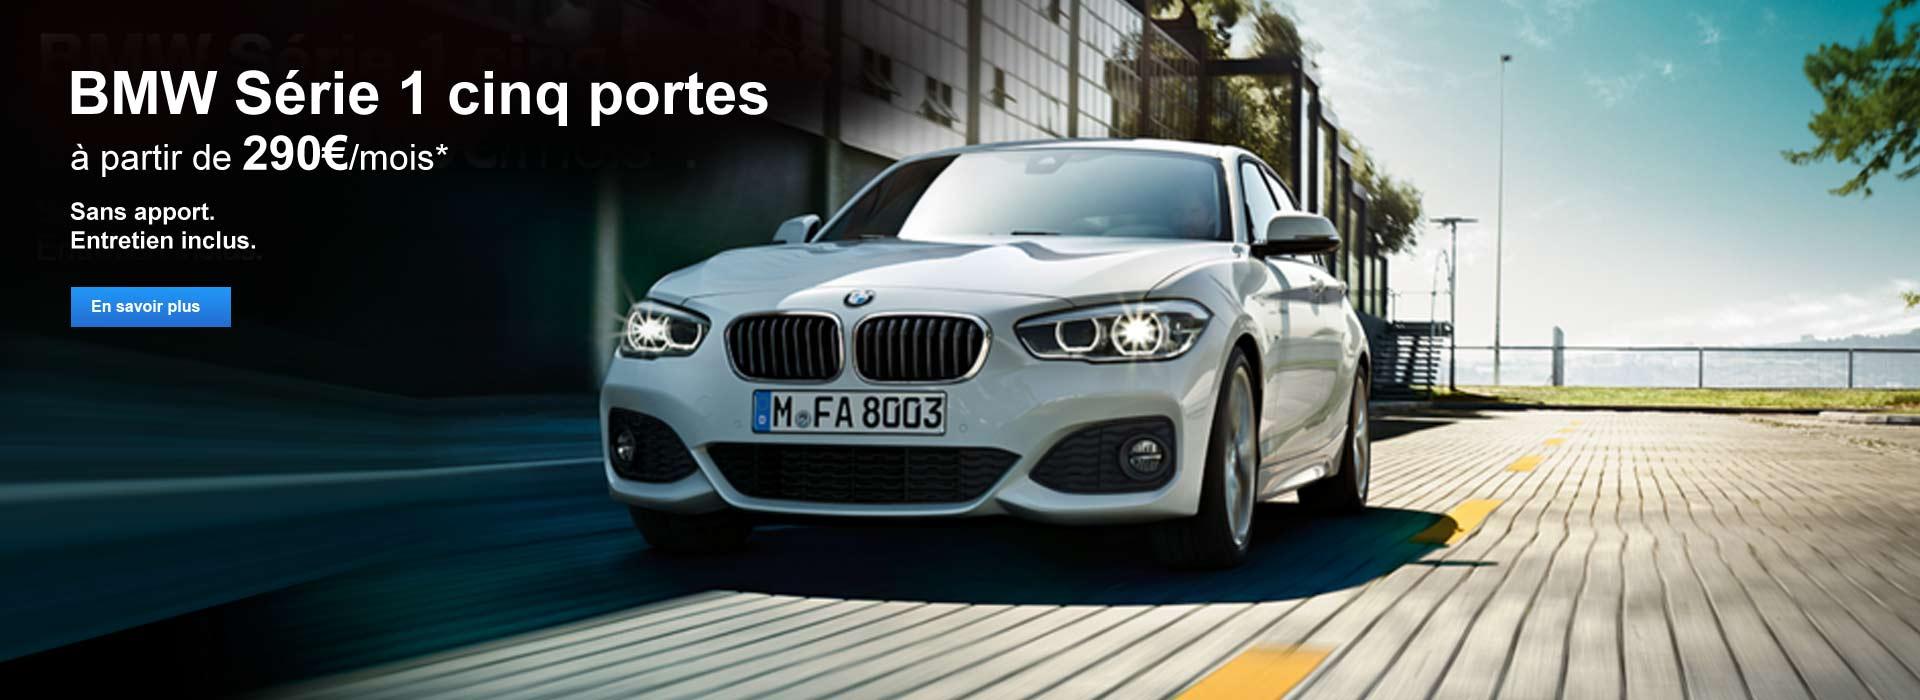 BMW Serie 1 5 Portes